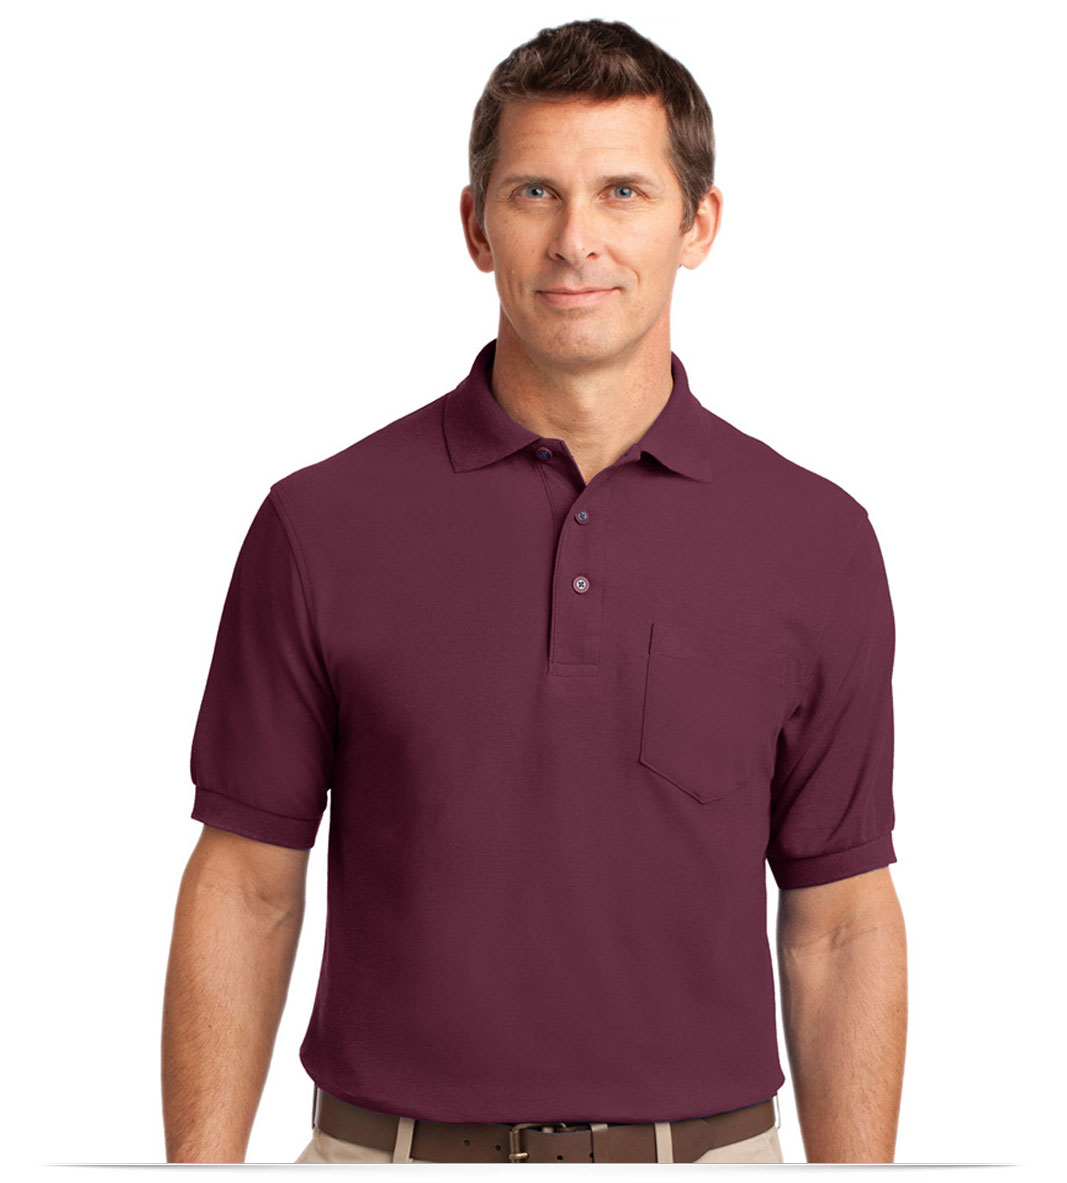 Custom Polo Shirt with Pocket